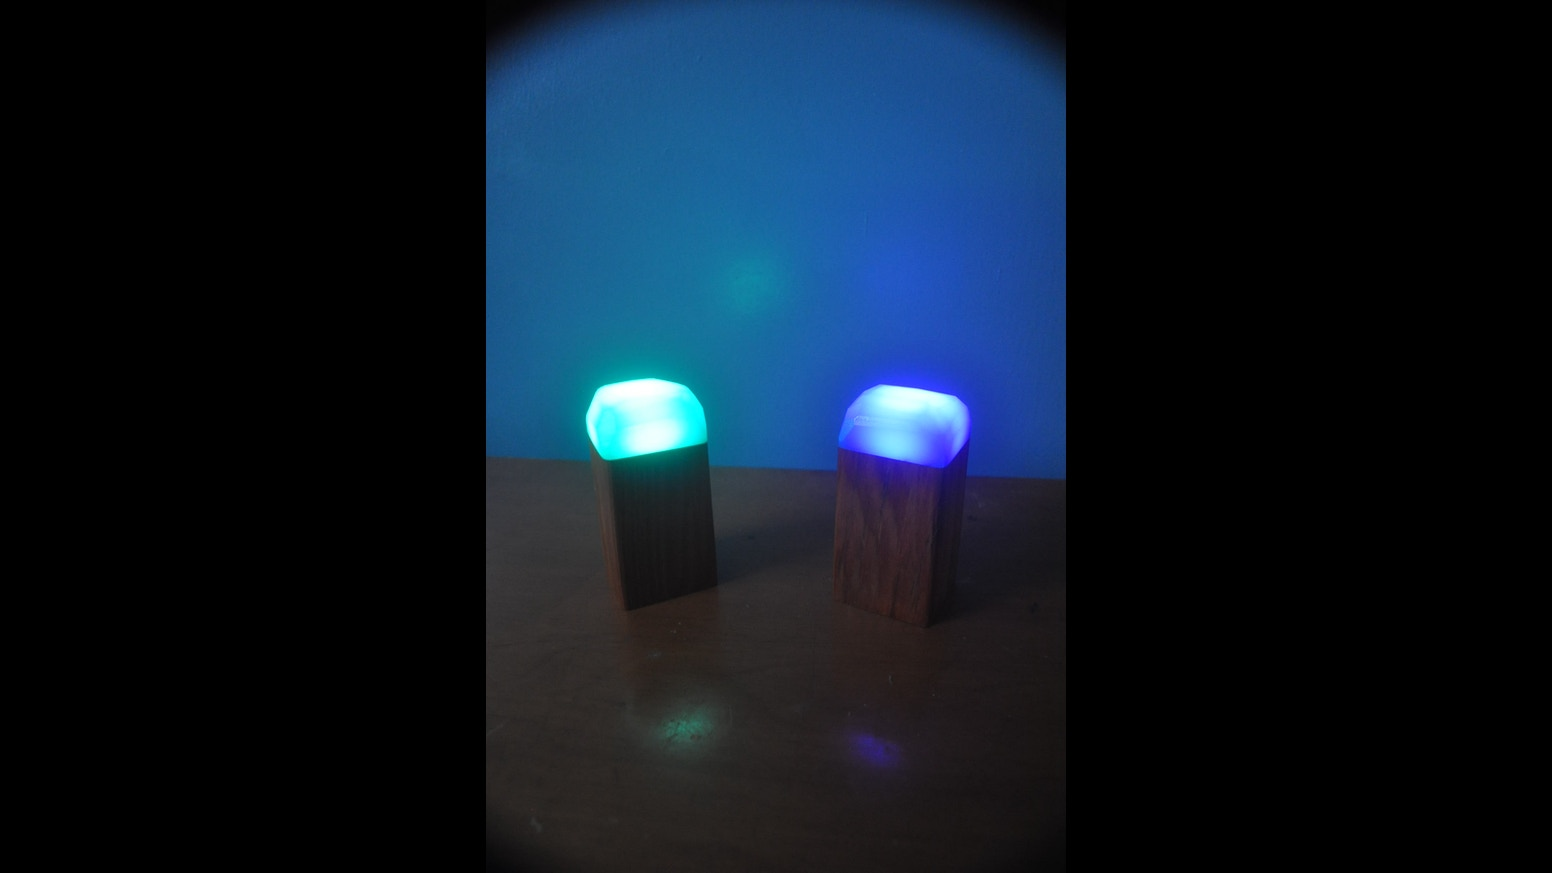 Led night light kickstarter - Powered By A Small 9 Led Flashlight